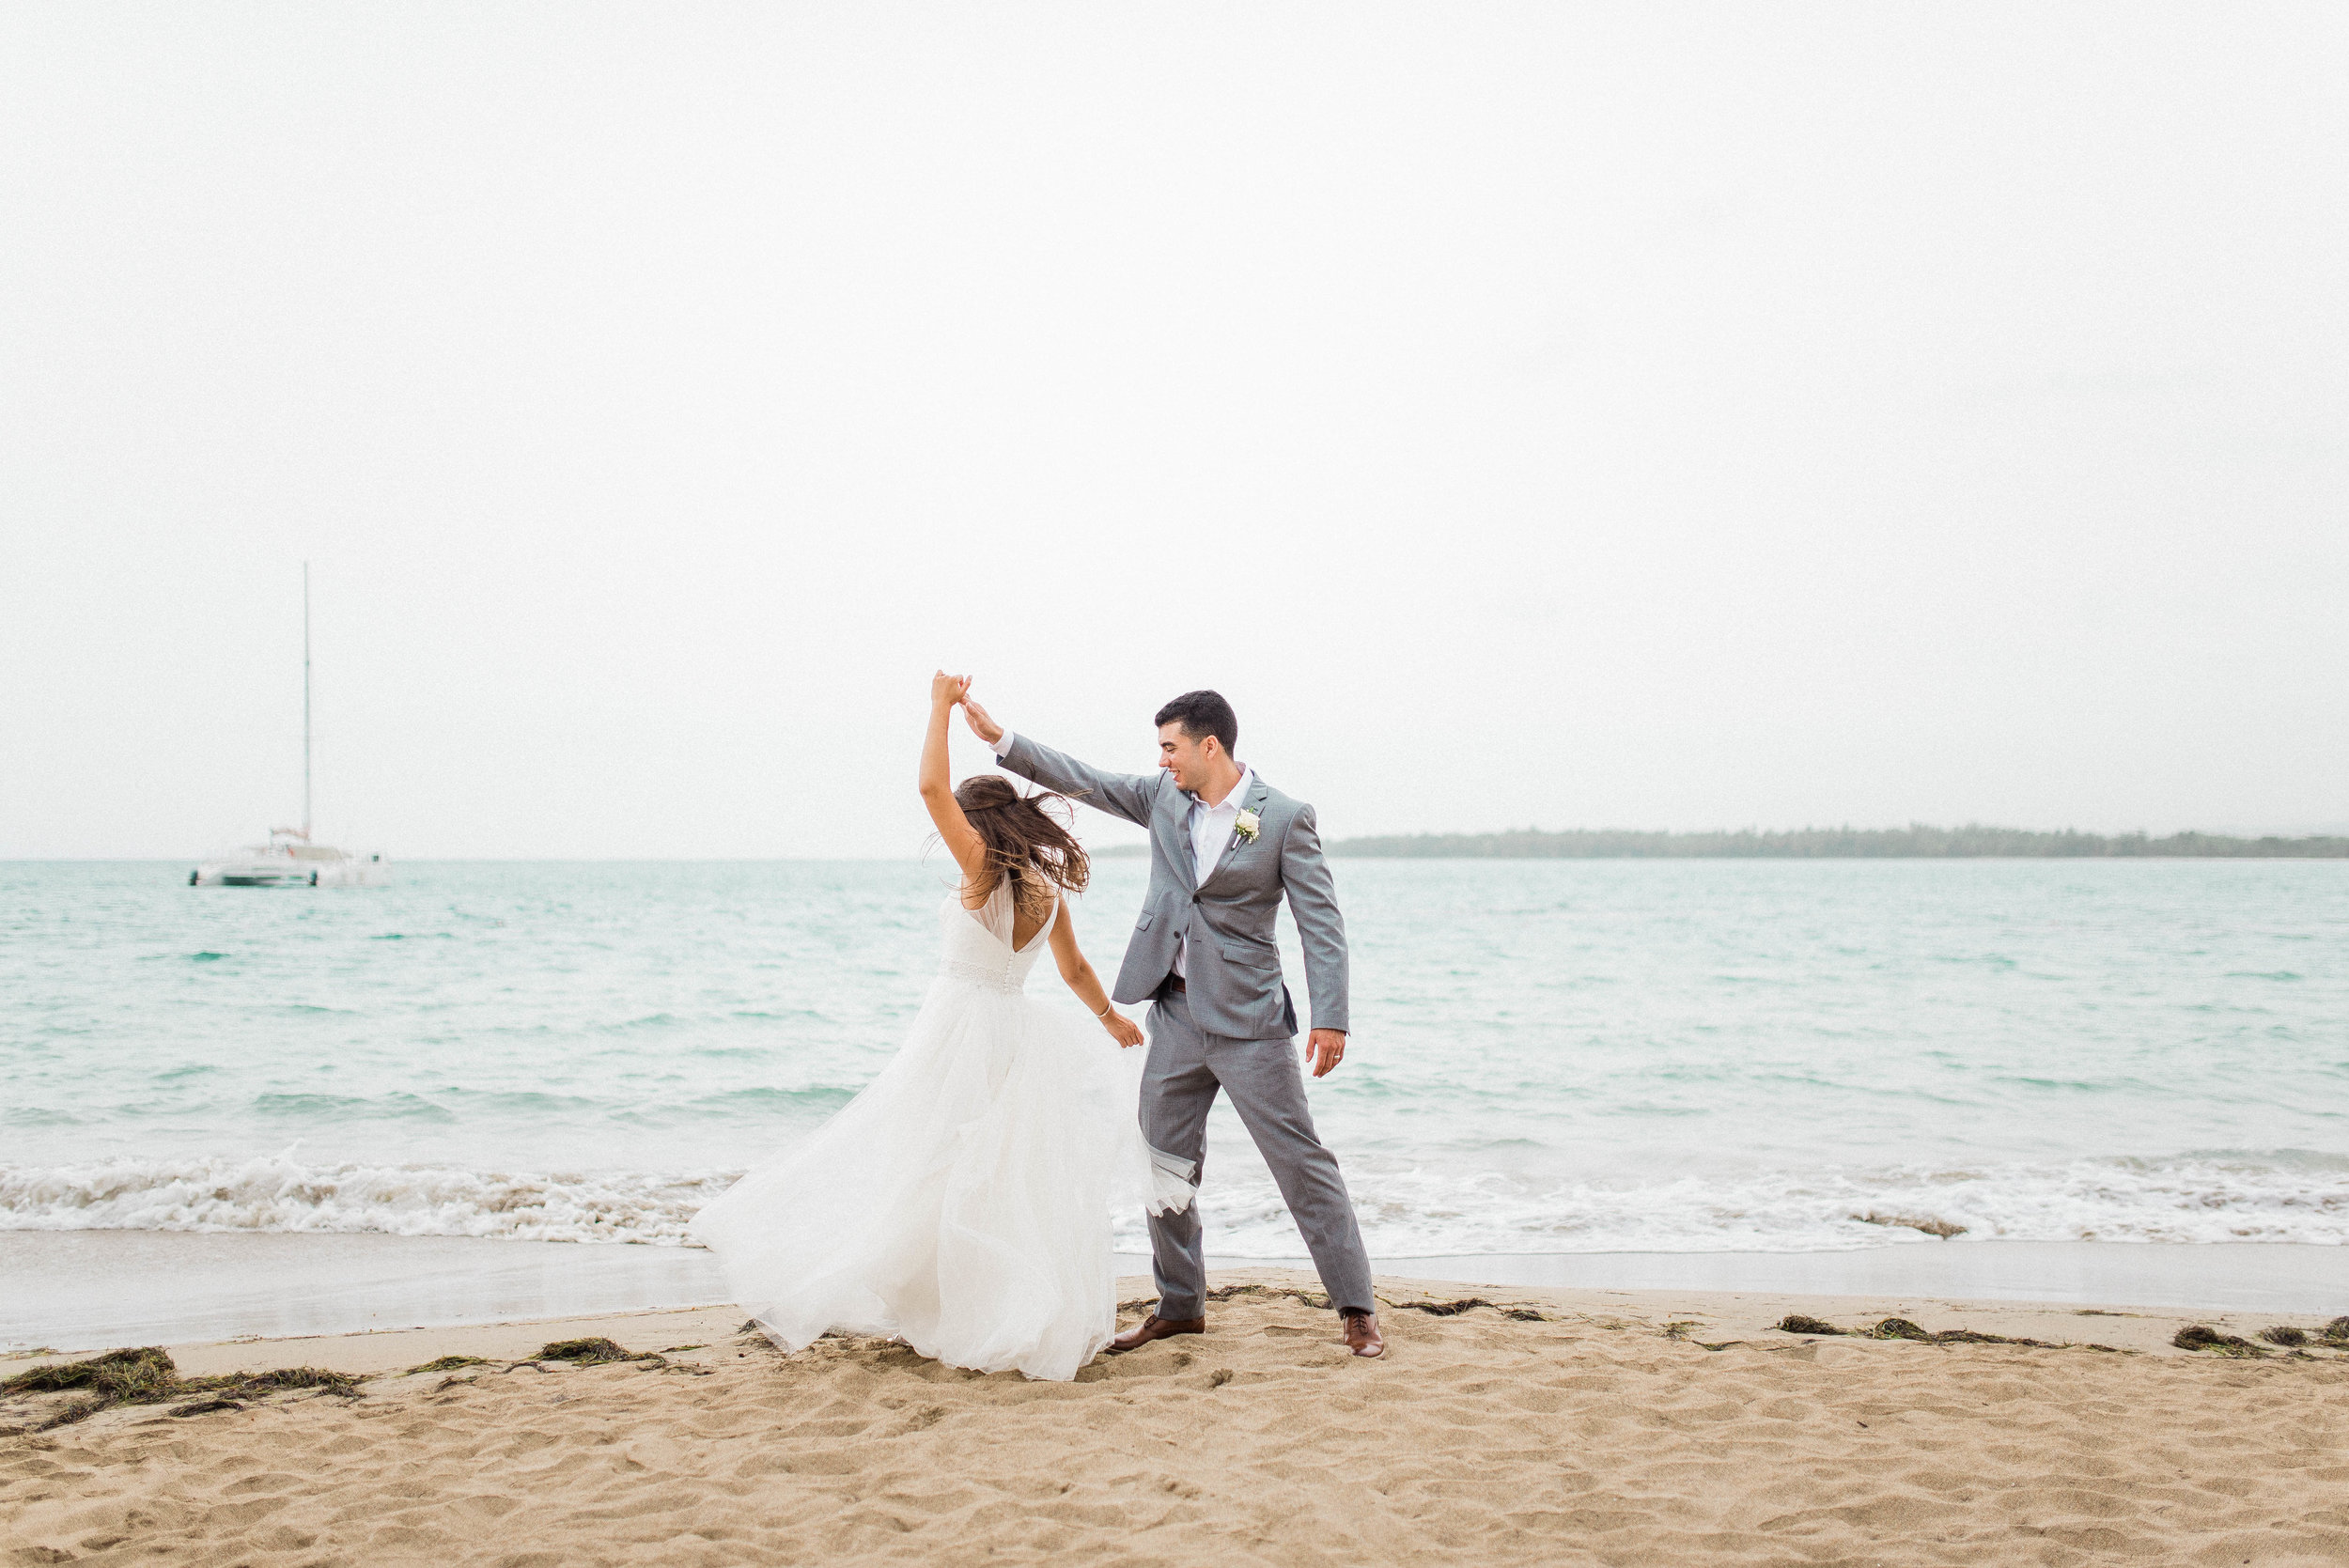 Michaella + Javi   Romantic Bilingual Catholic Mass & Oceanside Fiesta on the Beach in Puerto Plata, Dominican Republic   Indianapolis Elopement & International Destination Wedding Photographers